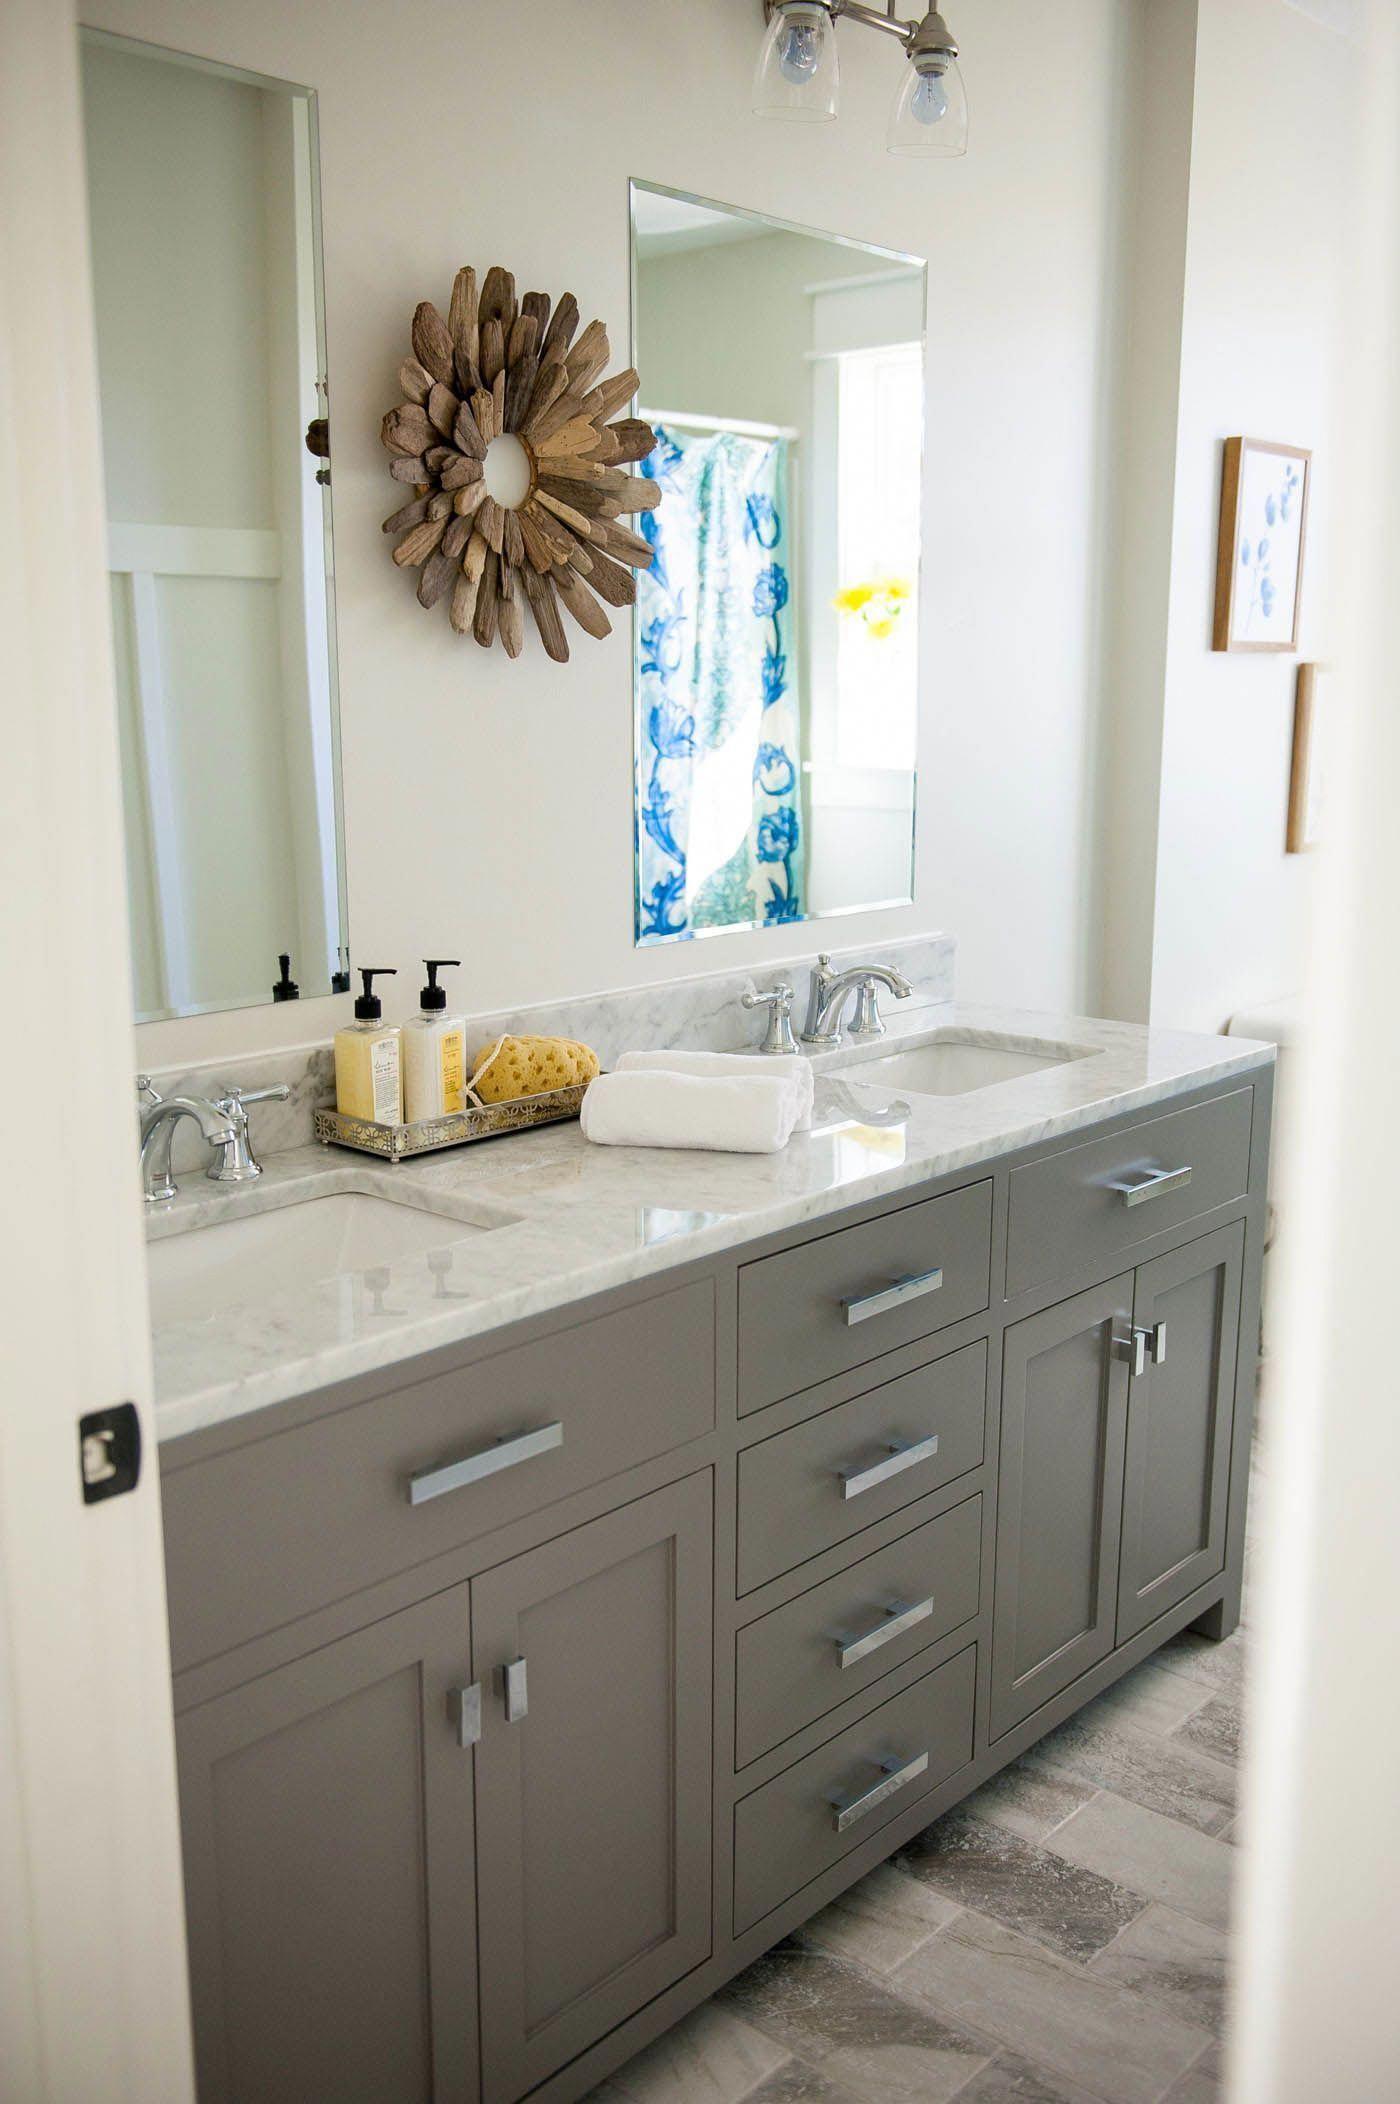 Double Bathroom Vanity Designs Ideas A Double Trough Sink Bathroom Vanity Has Actually Basins Recess Double Vanity Bathroom Grey Bathroom Vanity Sink Remodel [ 2104 x 1400 Pixel ]